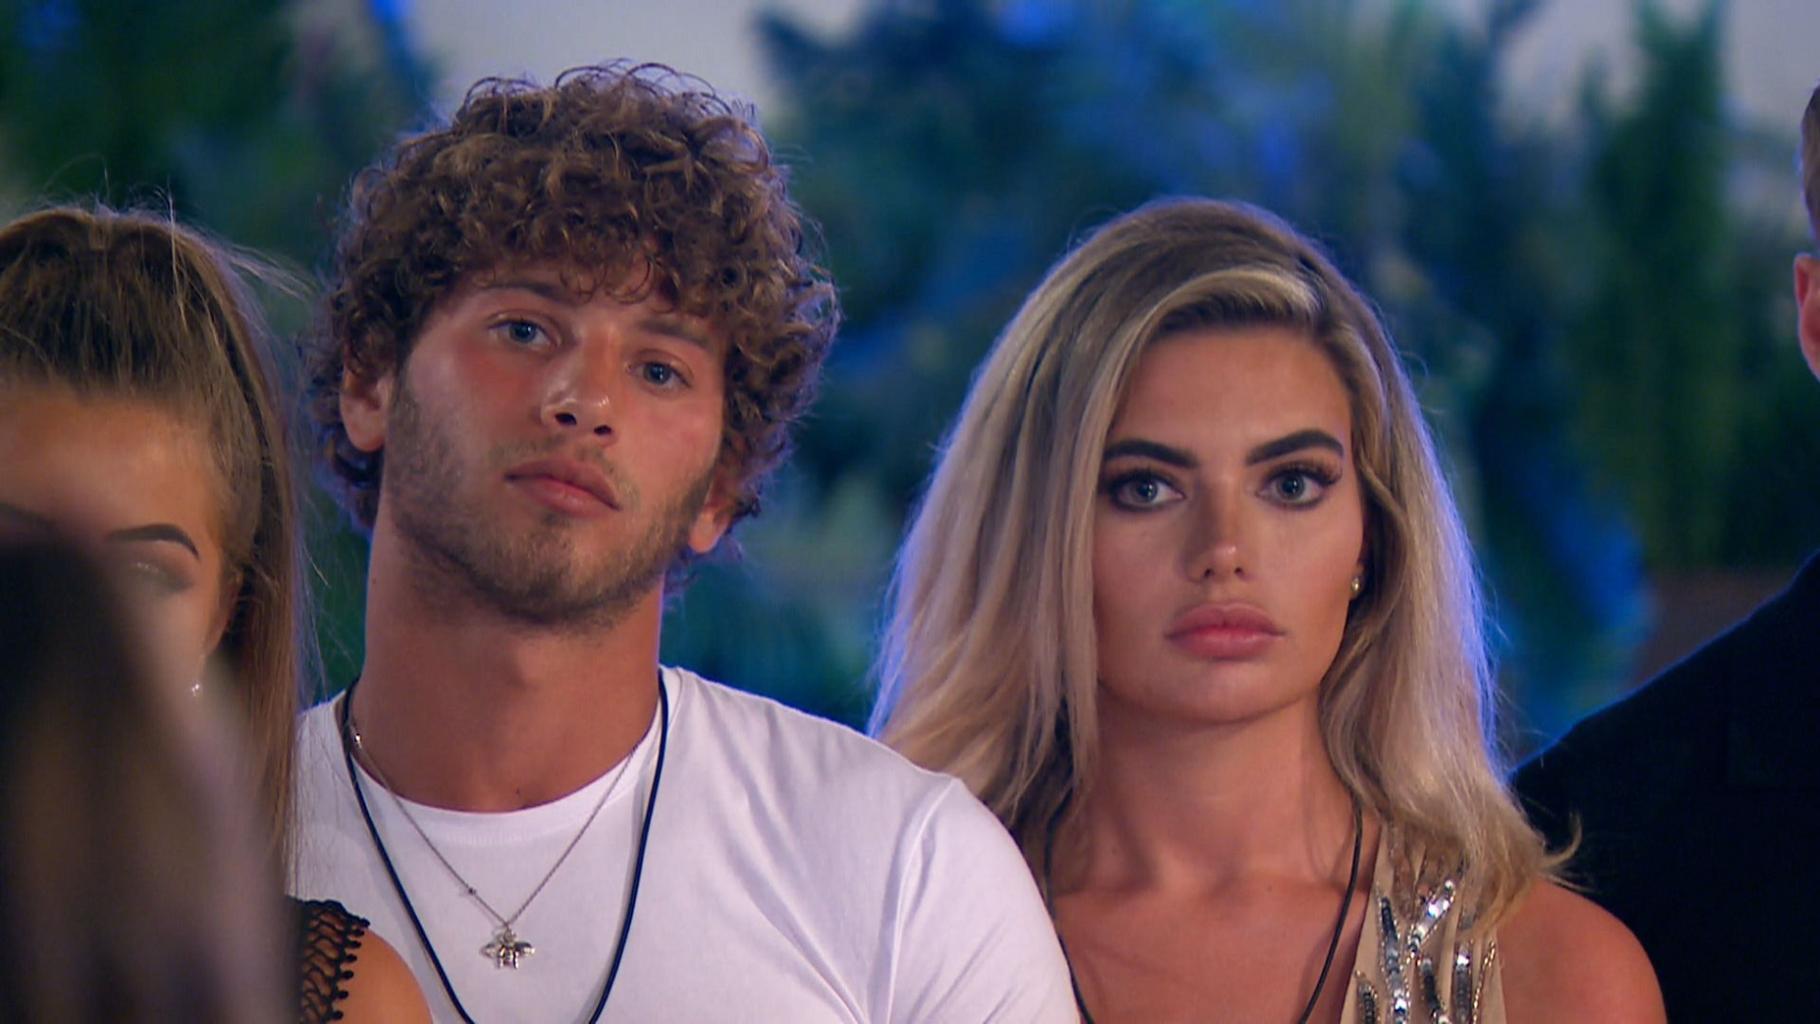 Scott Disick Tells Love Island S Megan Barton Hanson To Apologise To Eyal Booker For 2018 Series